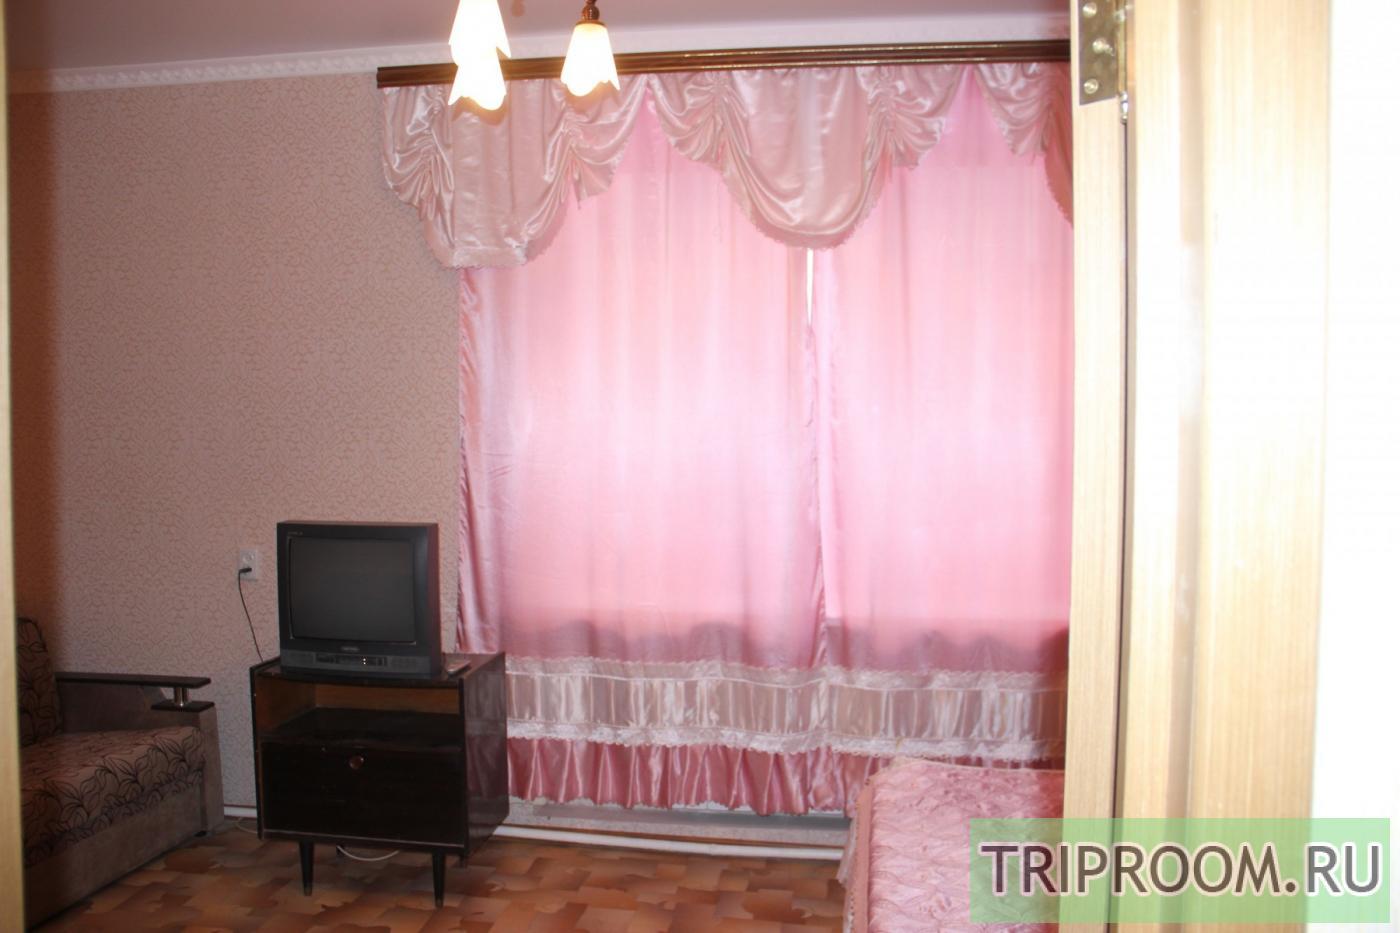 1-комнатная квартира посуточно (вариант № 4690), ул. Пушкинская улица, фото № 3